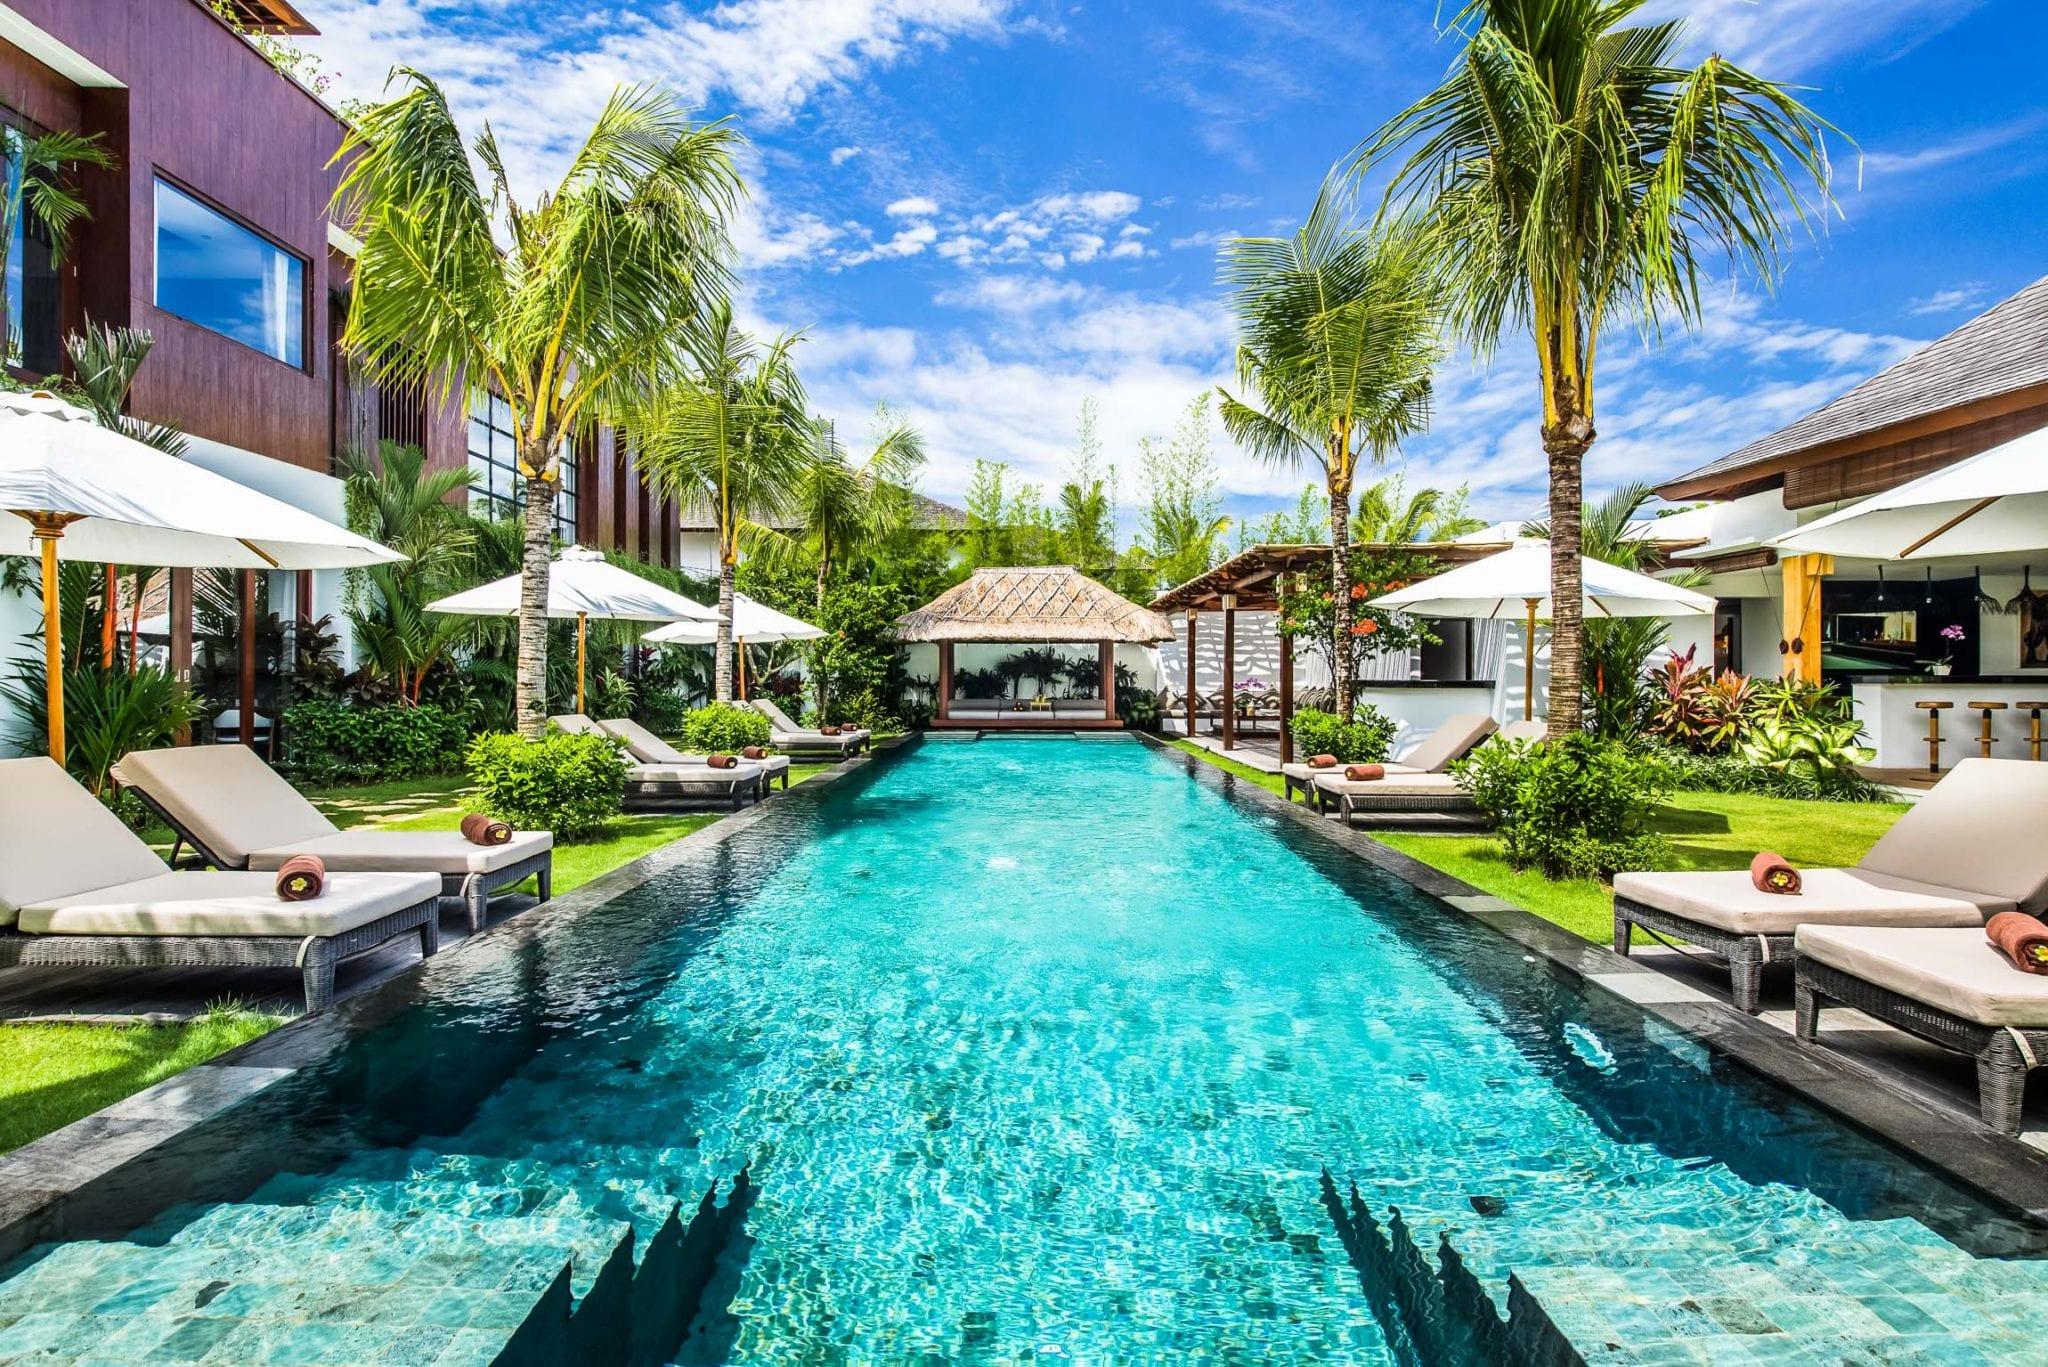 Luxury Retreat Villa in Seminyak, Bali / 10 bedrooms / 10 bathrooms / Pool